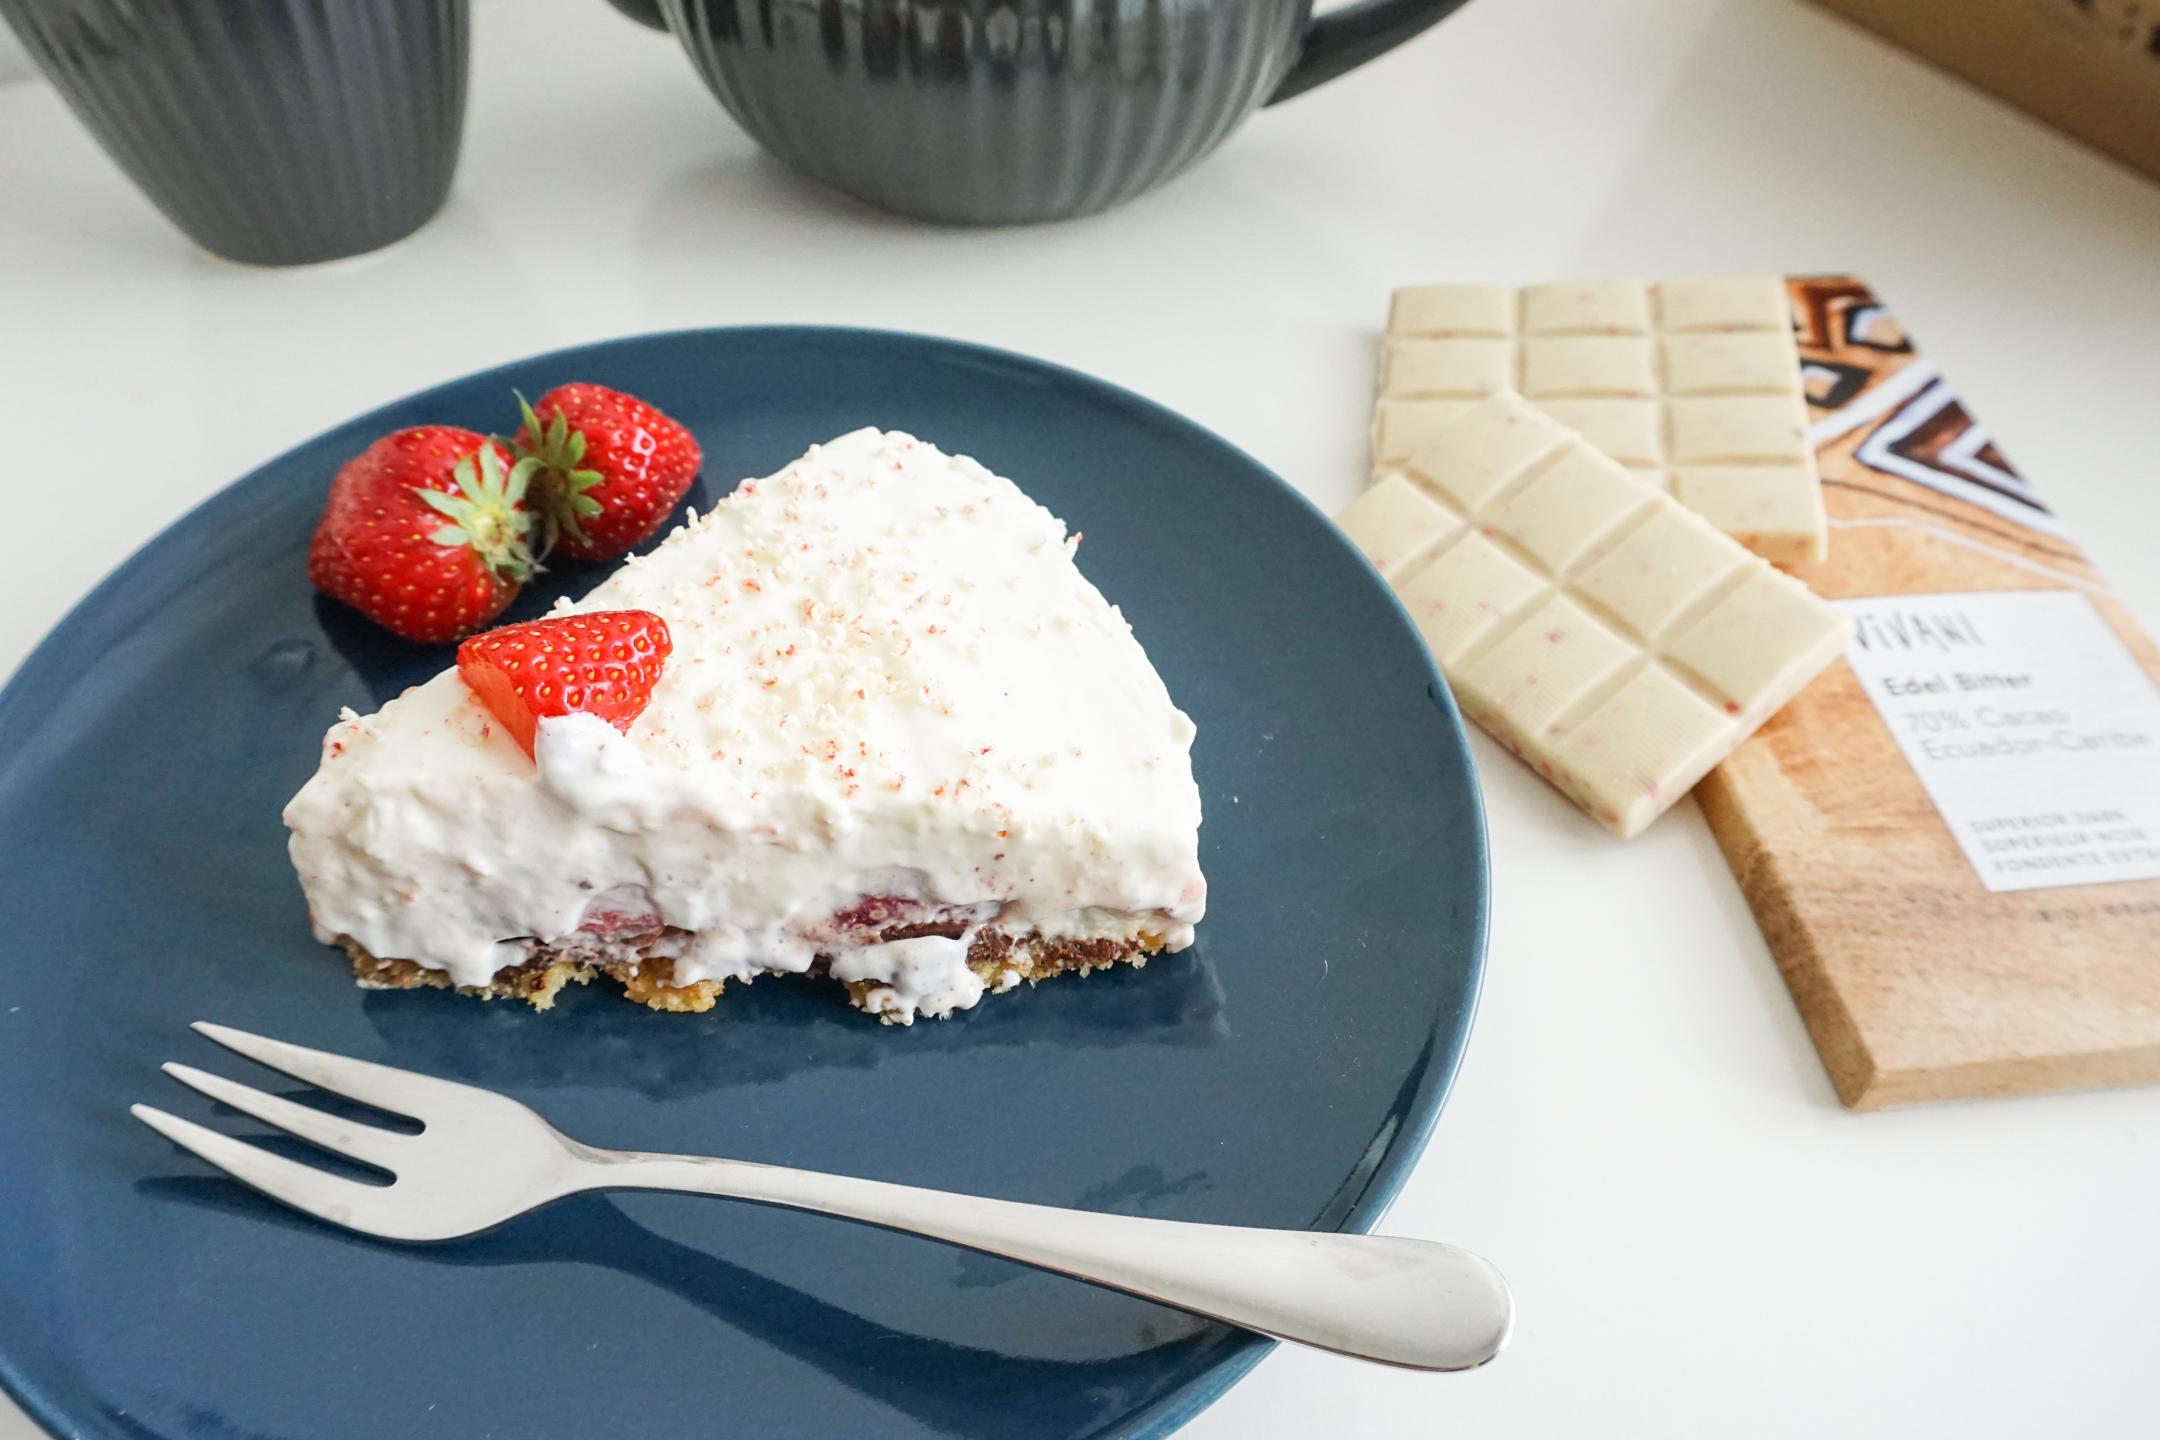 Erdbeer-Frischkäse-Torte-Schokolade-Vivani-Muttertag-Backen-Selbstgemacht-Foodblog-Berlin-Köln-Bonn